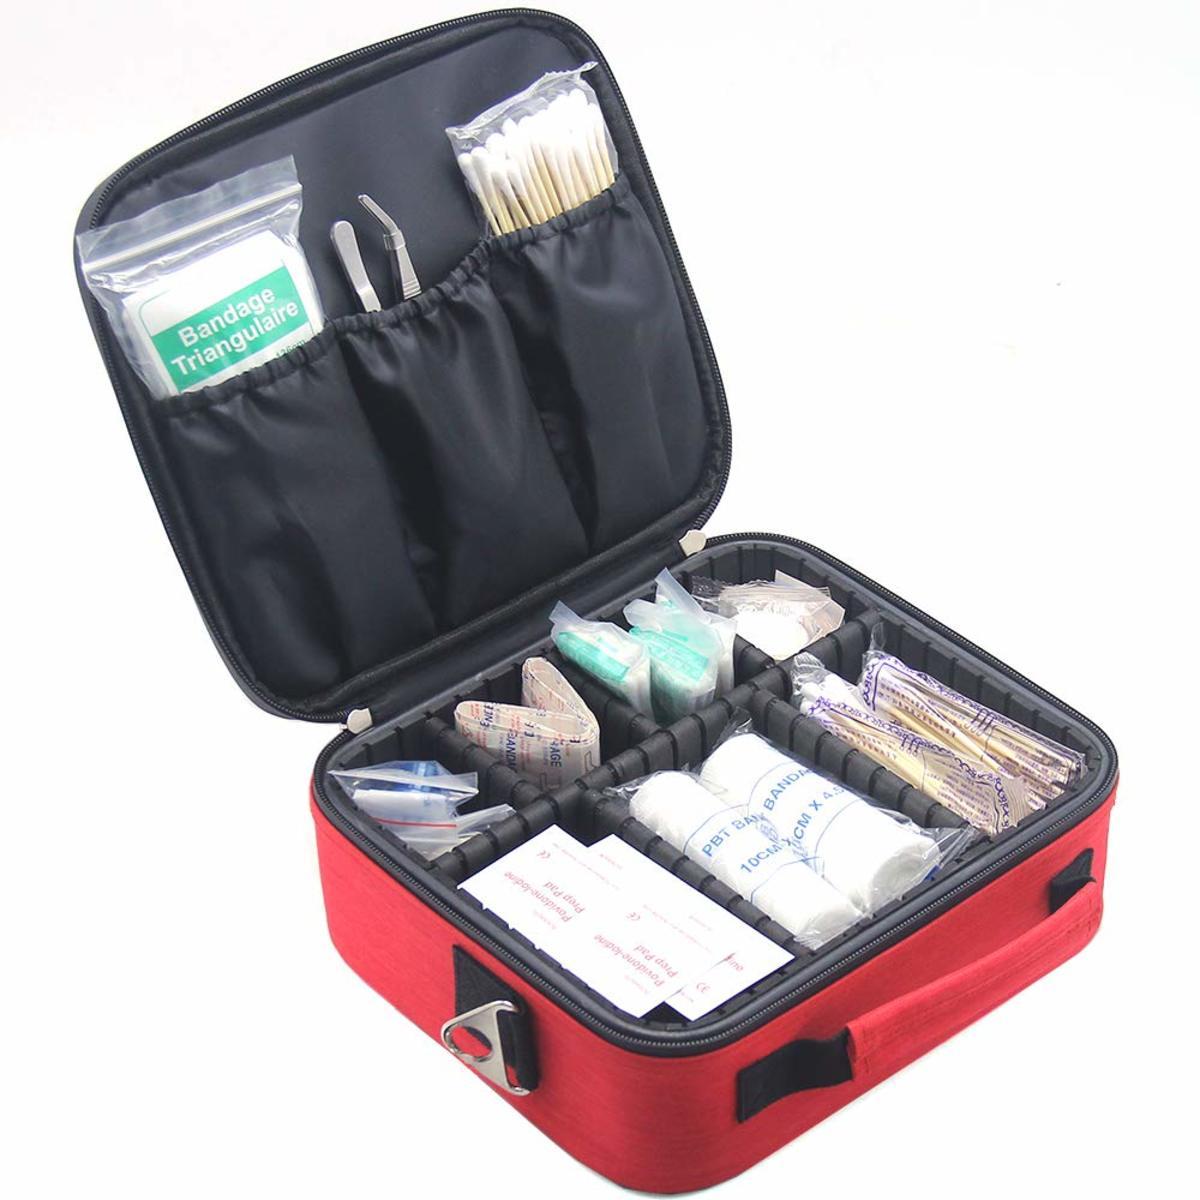 MONSTINA Empty First Aid Kit Bag